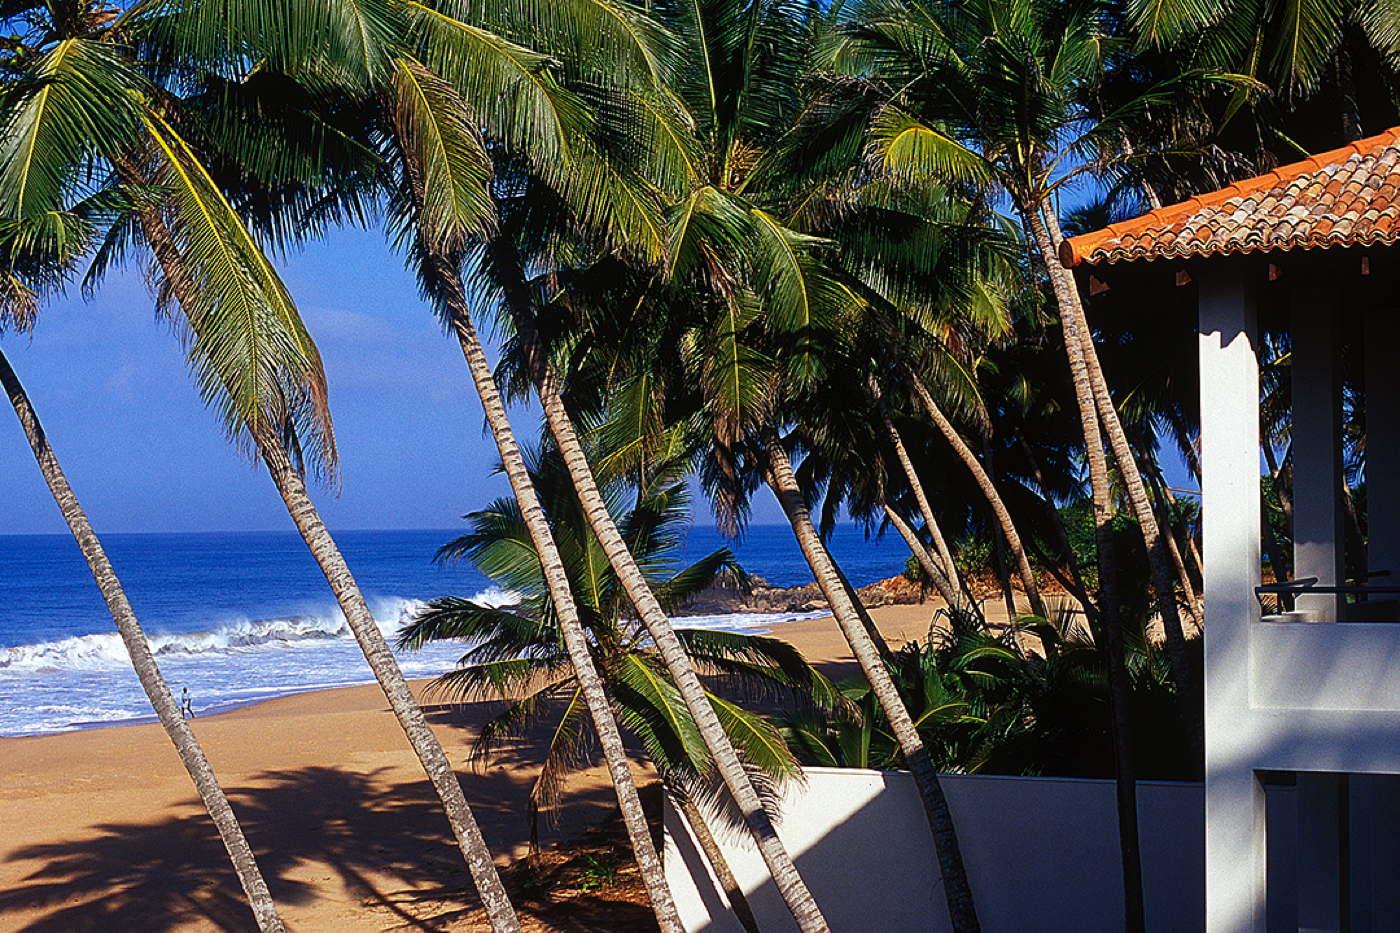 ferienhaus am strand mieten ferienvilla am meer mit pool sri lanka induruwa. Black Bedroom Furniture Sets. Home Design Ideas